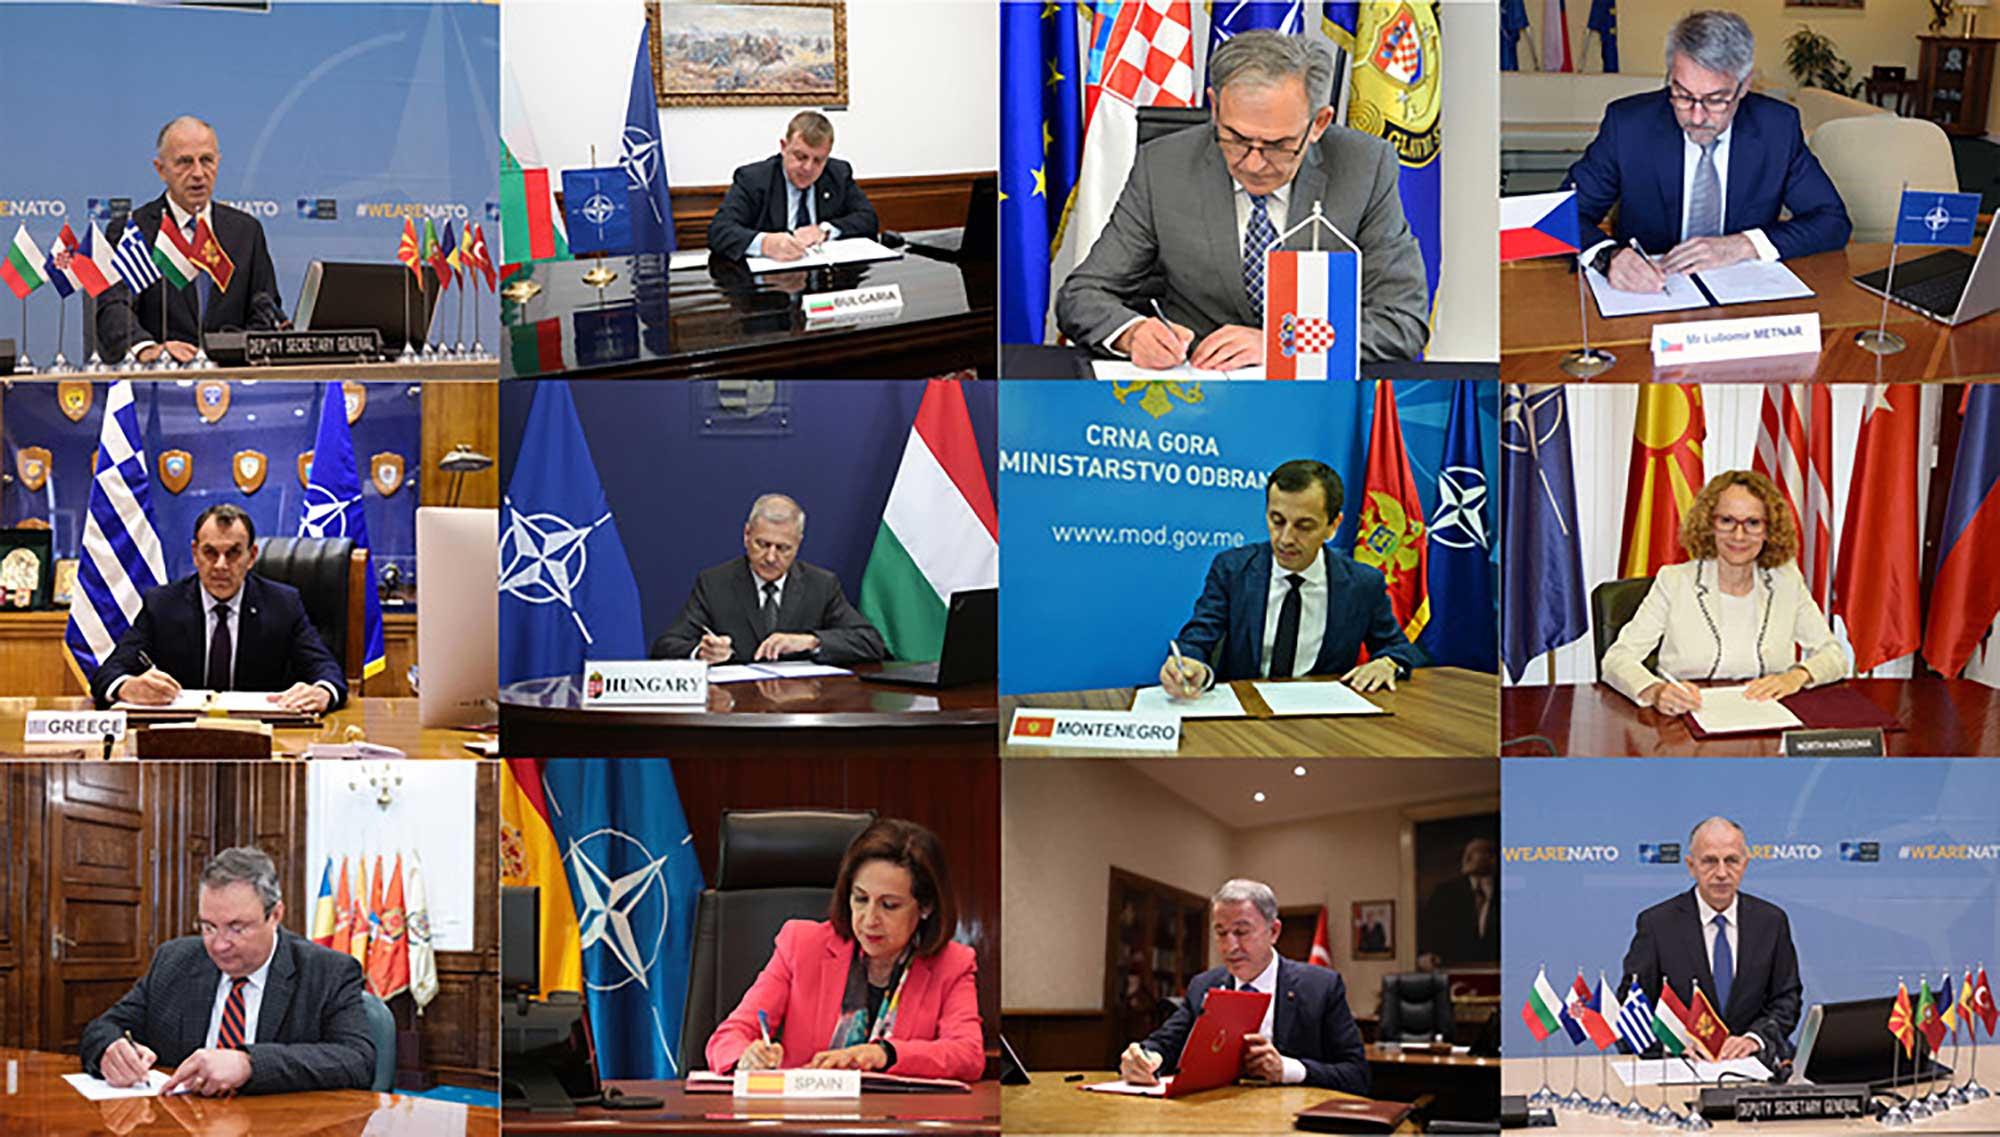 NATO ministers